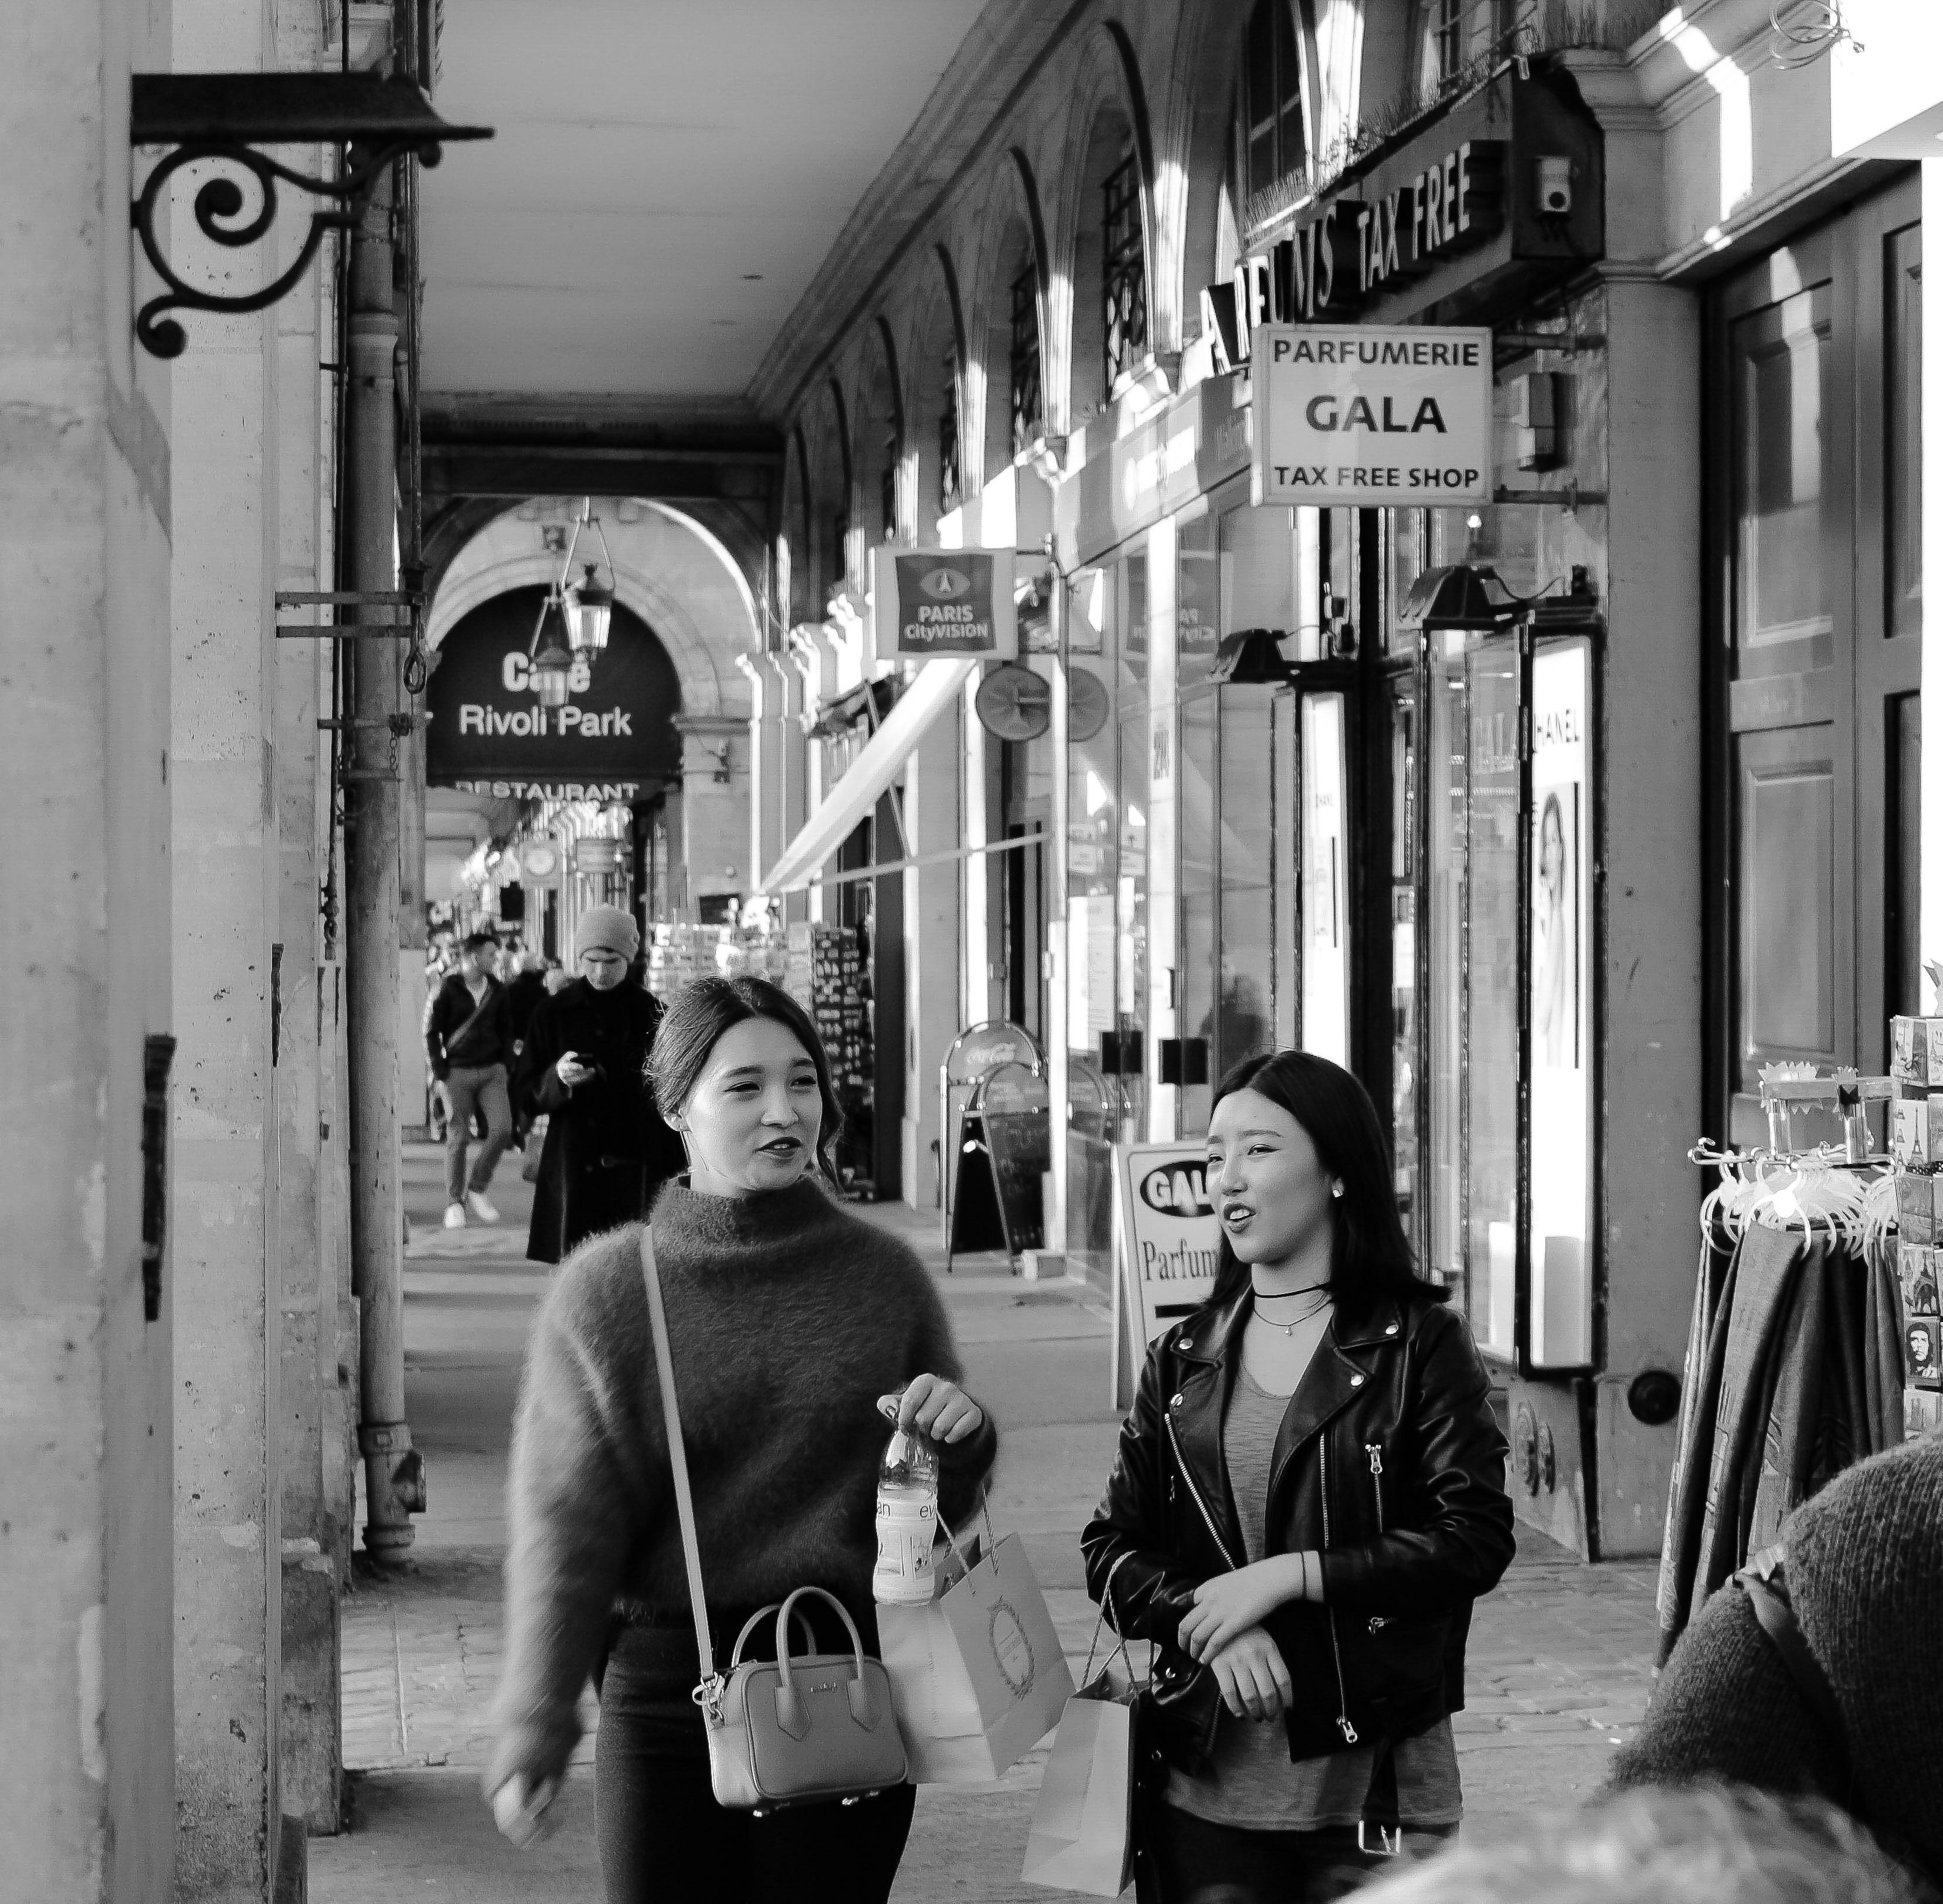 rue rivoli - 2015